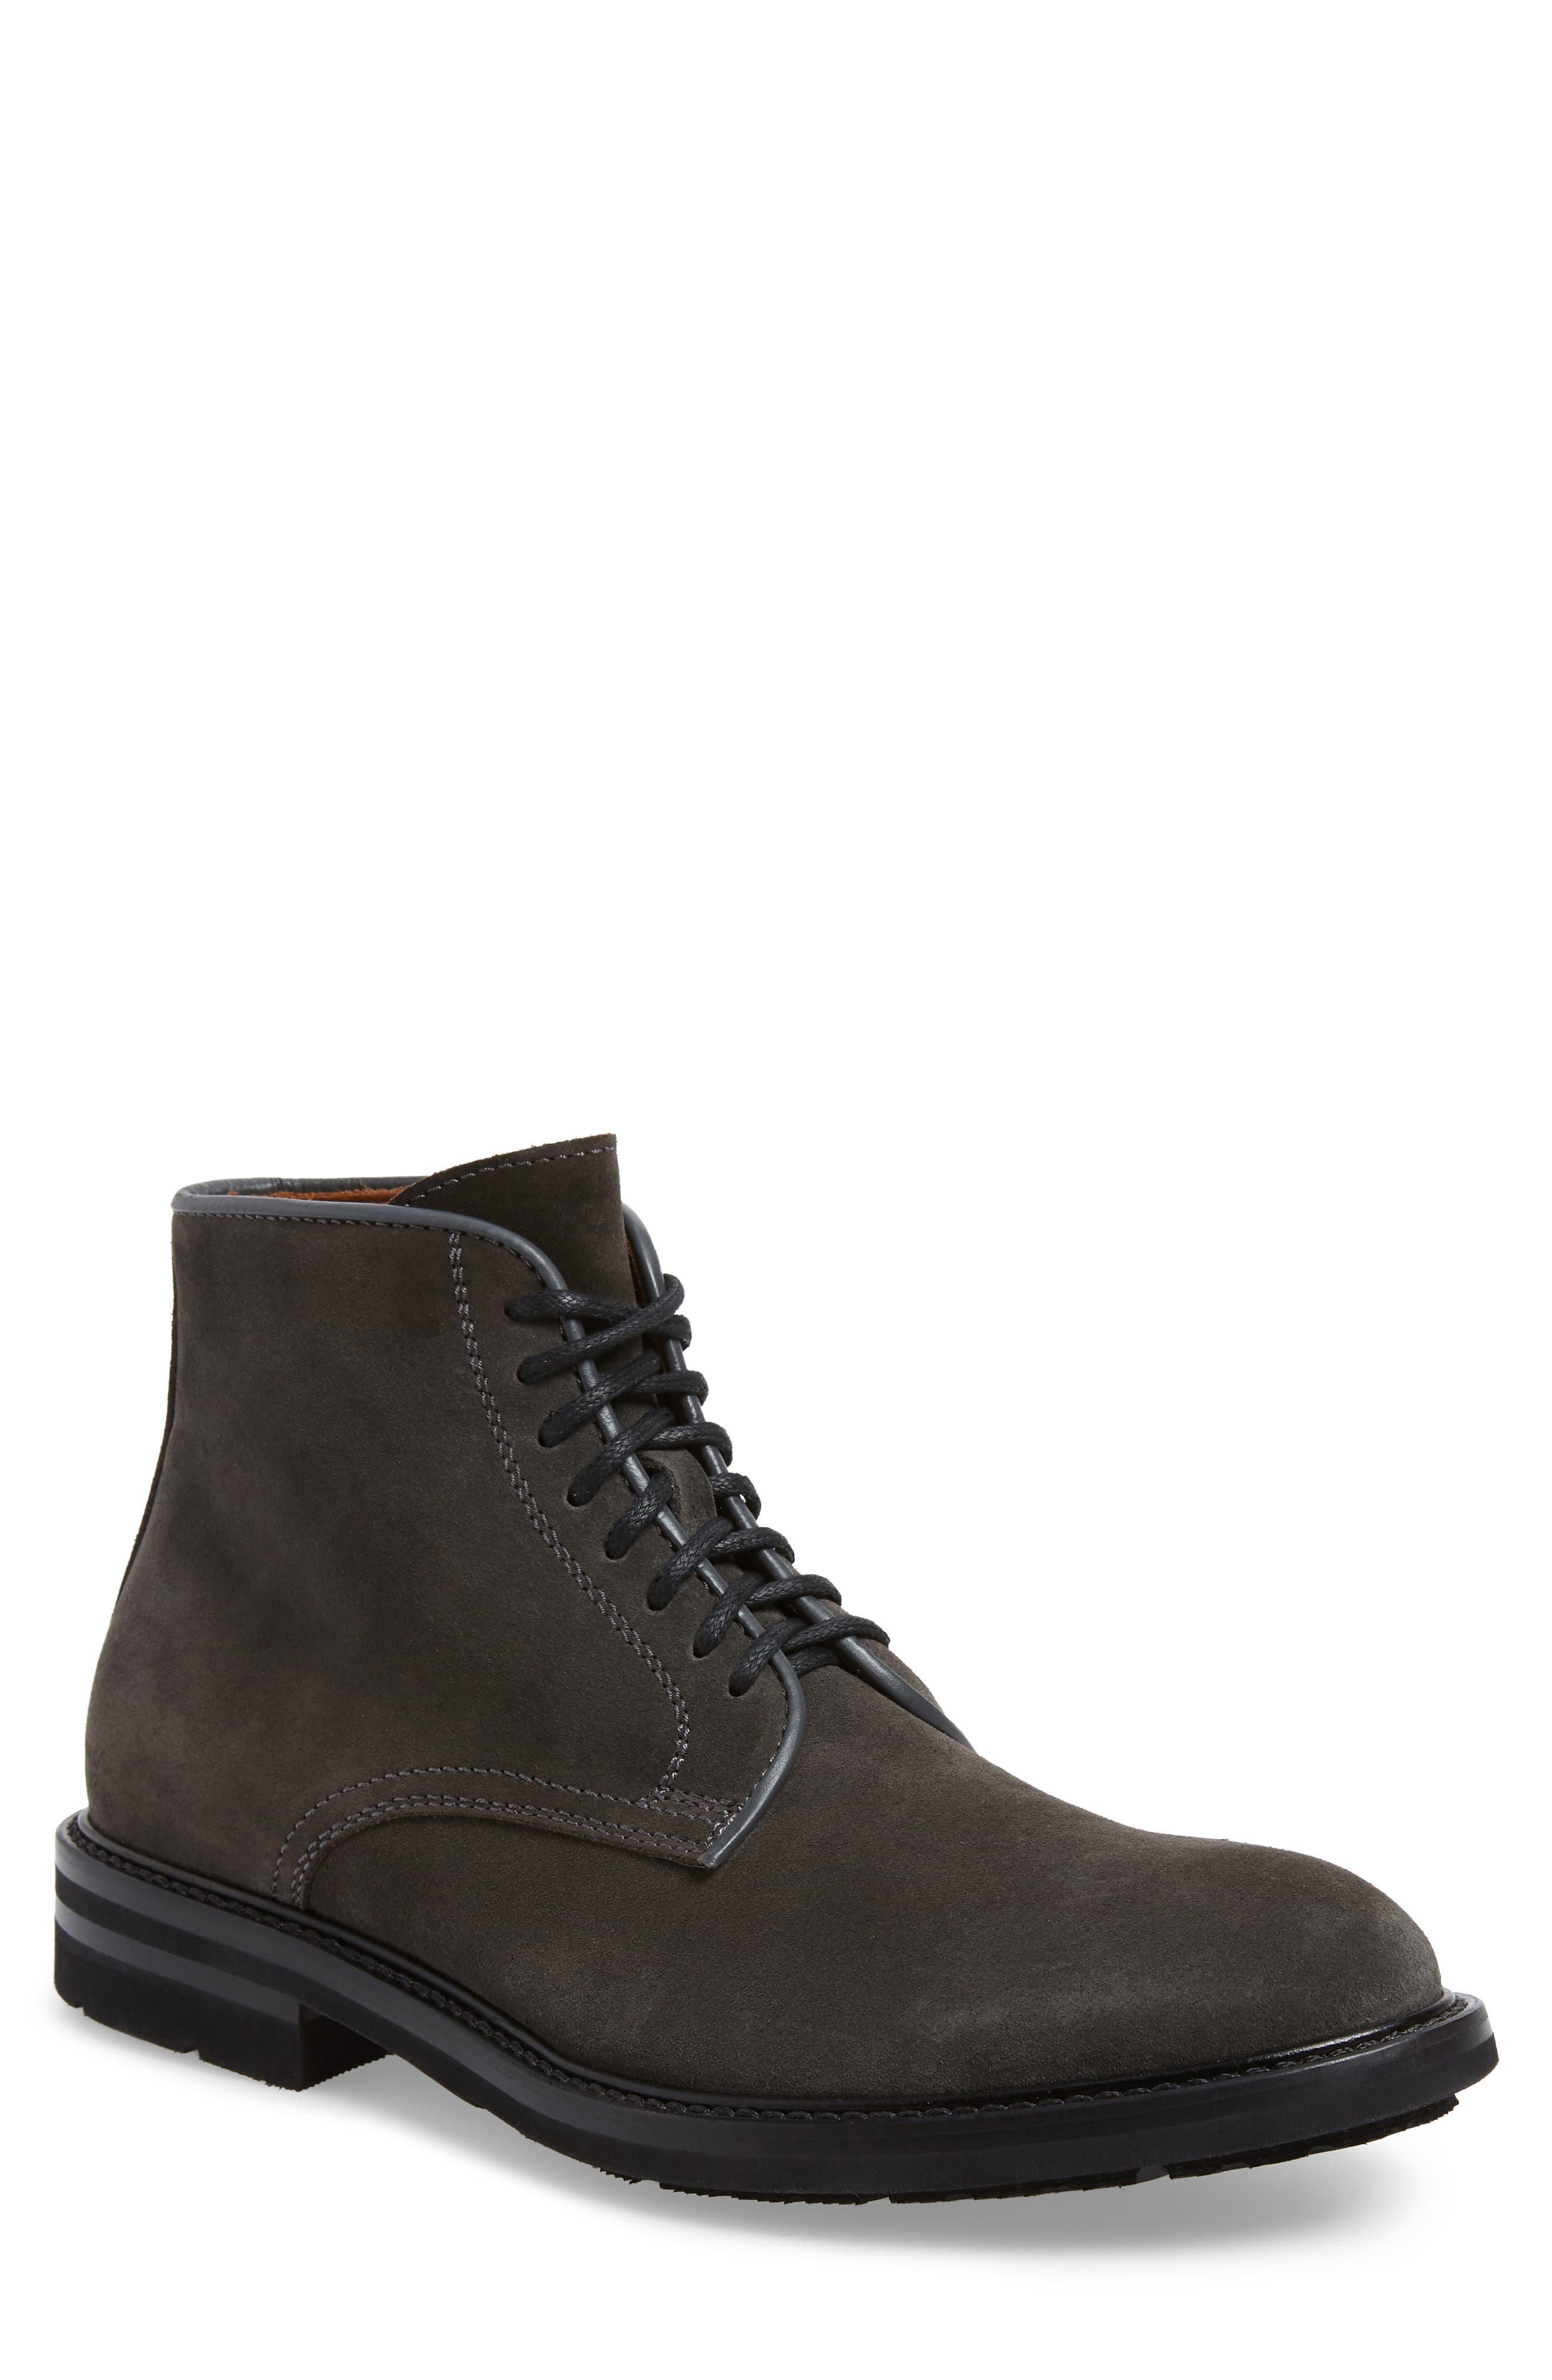 Aquatalia Renzo Weatherproof Lace-Up Boot- Grey